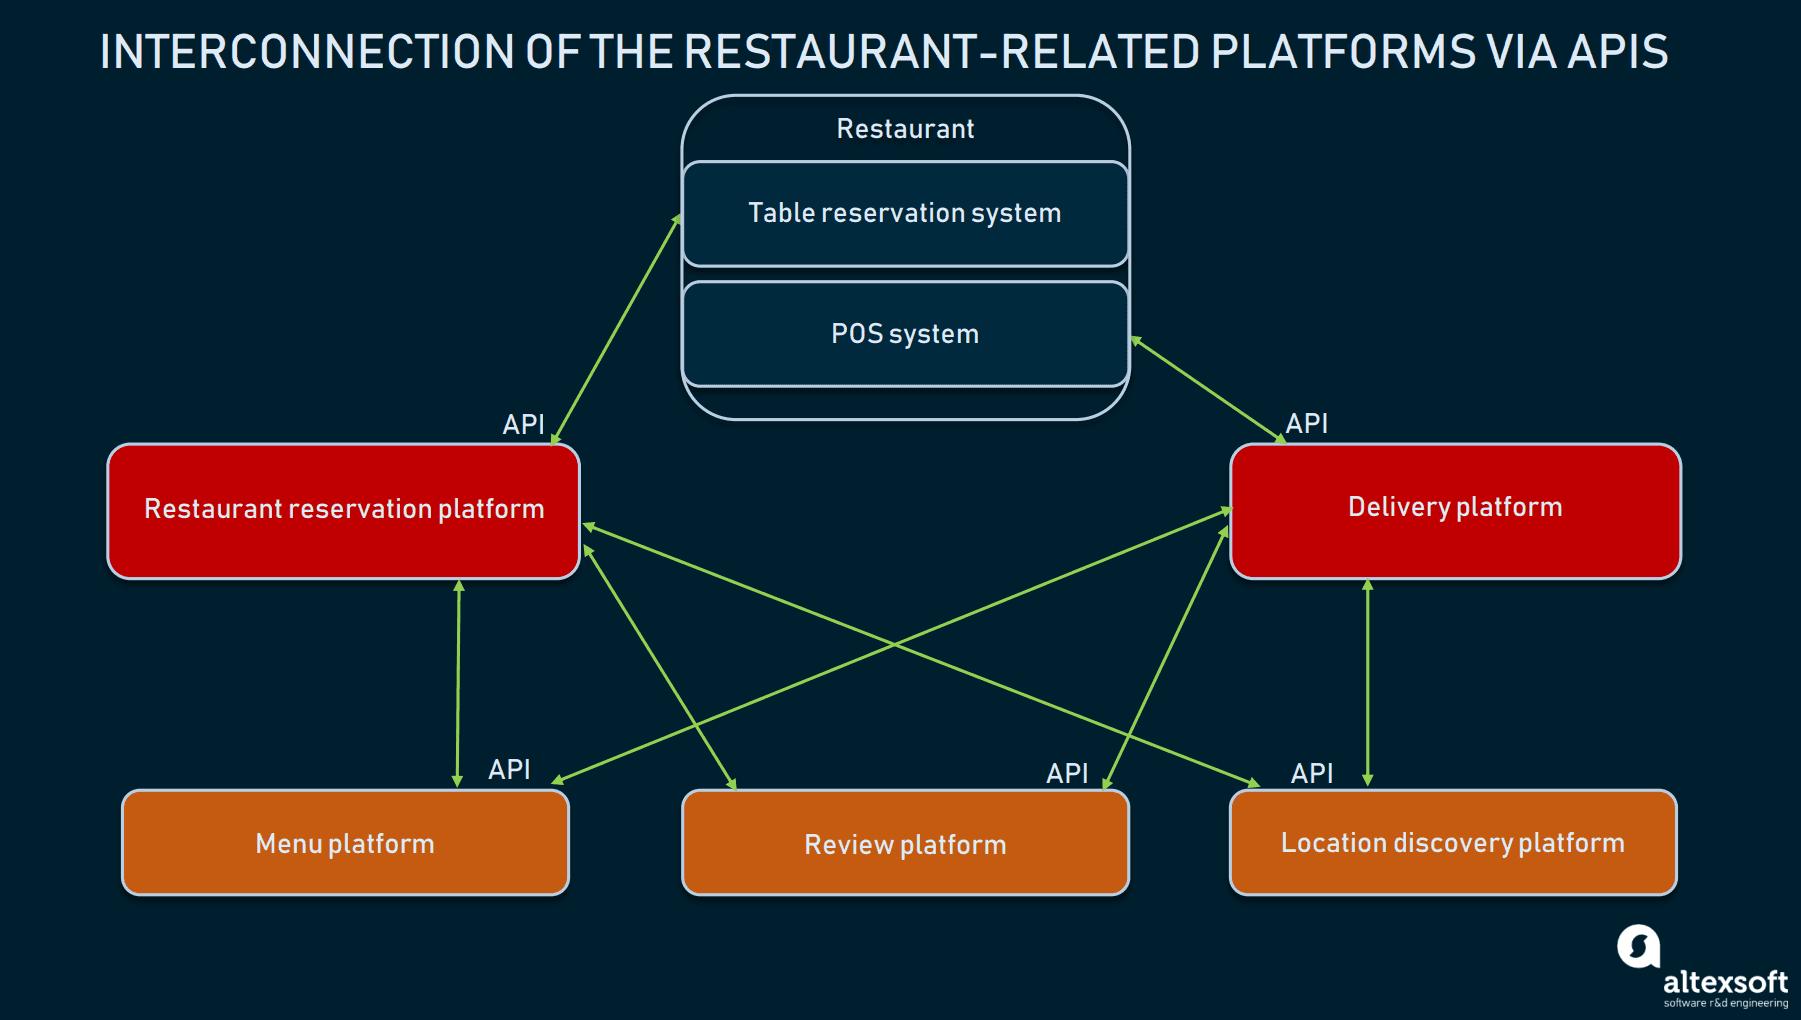 Communication of restaurant-related platforms via their APIs